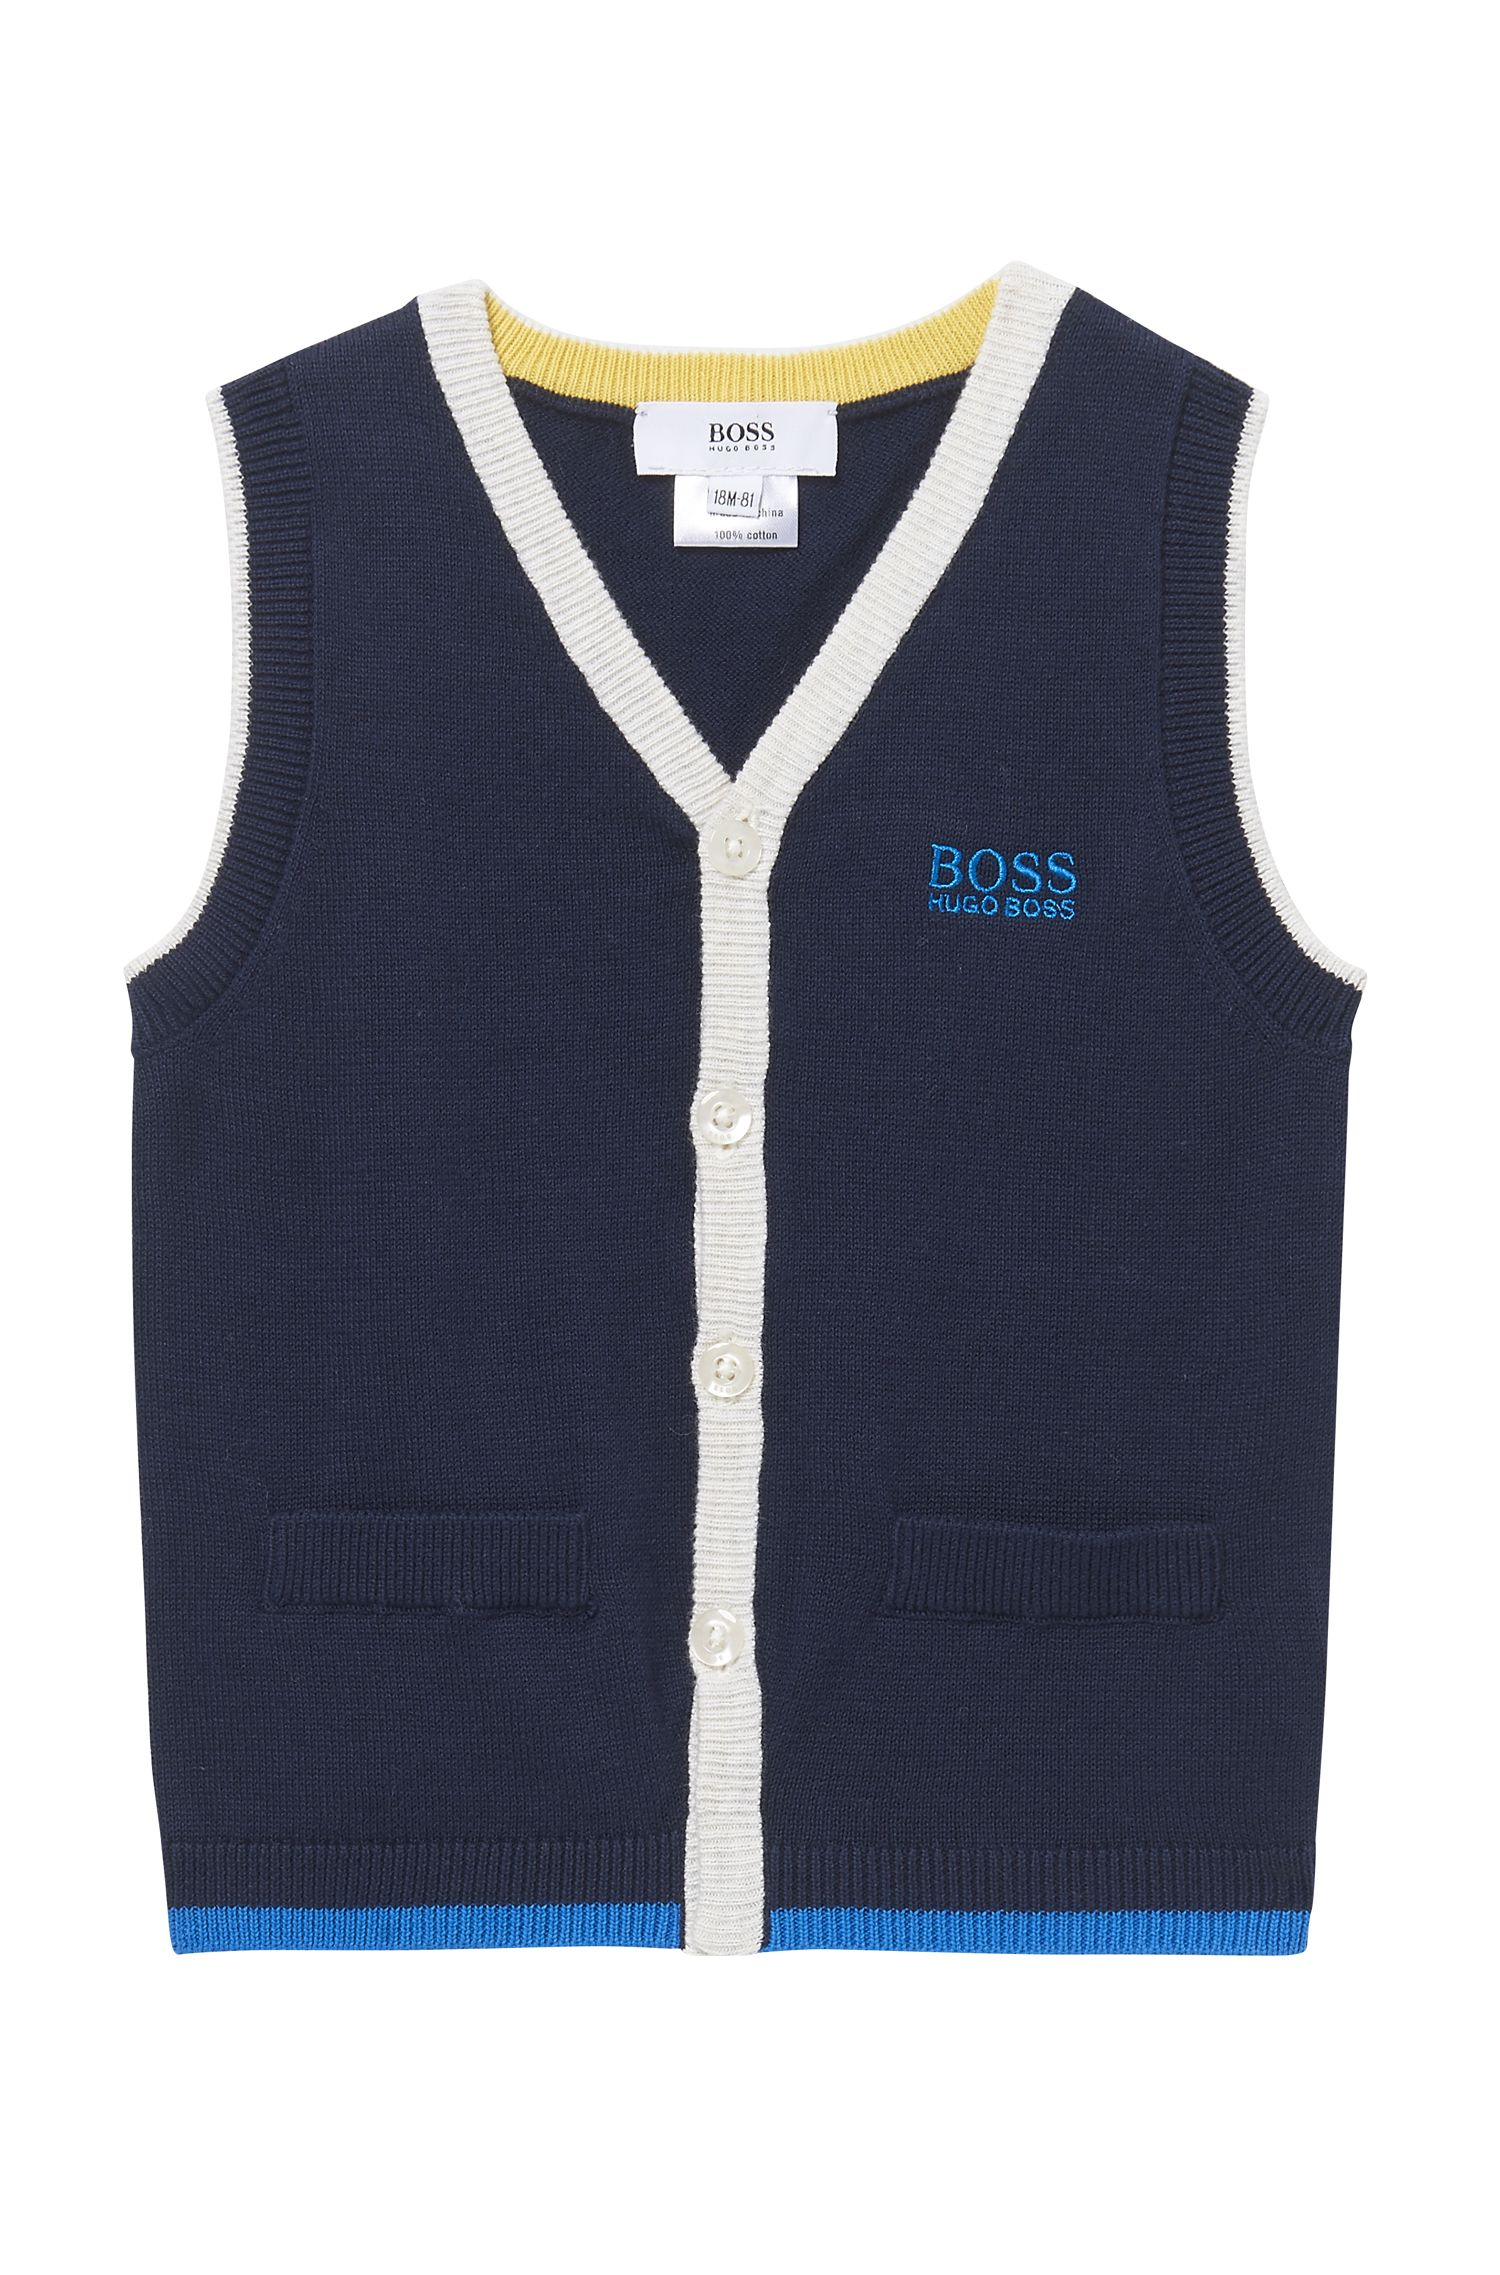 'J05523' | Toddler Stretch Cotton Blend Sweater Vest